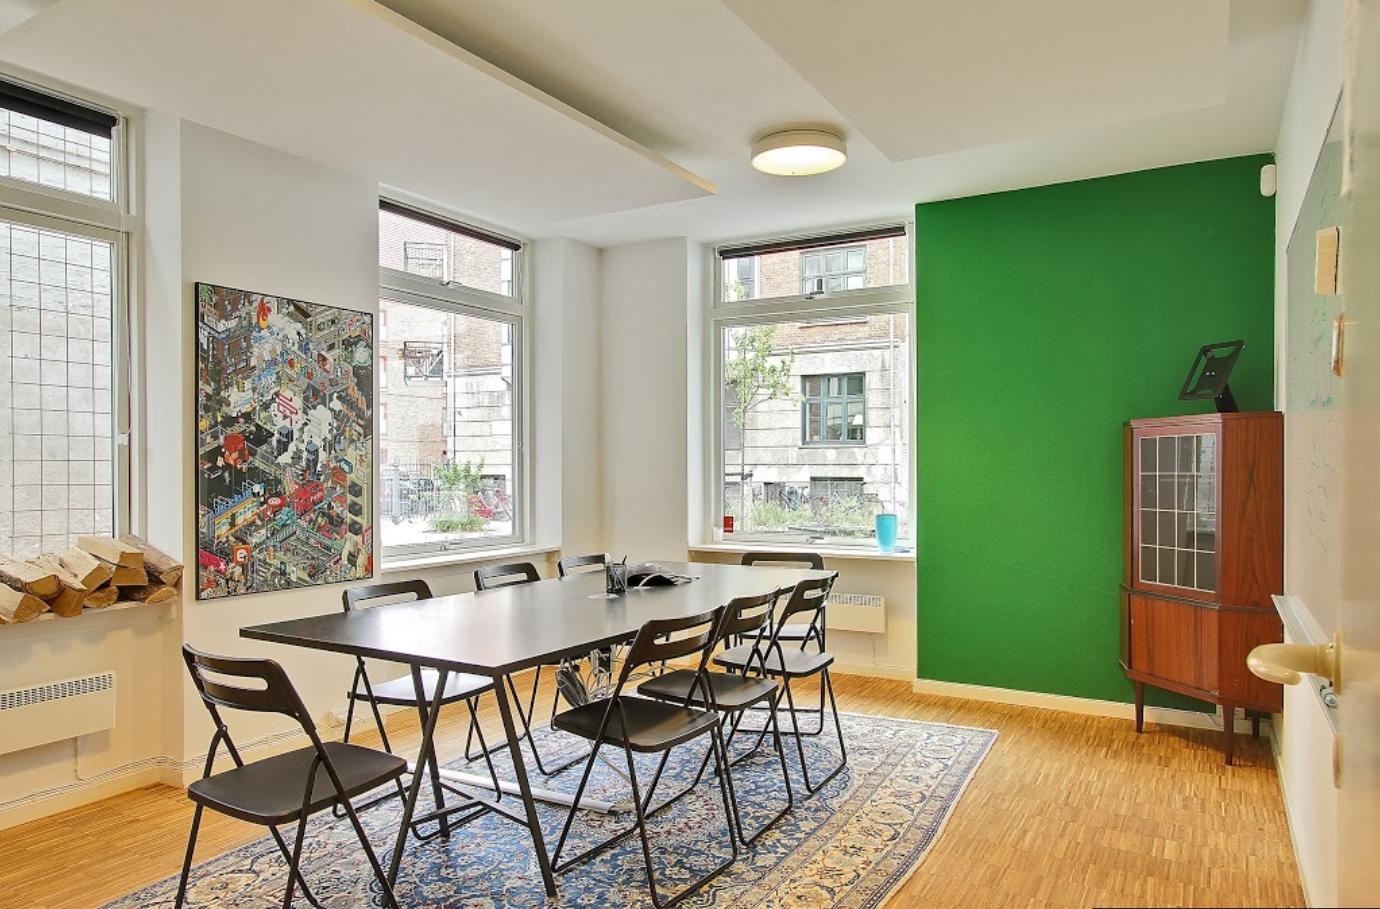 drivr-office-copenhagen-5